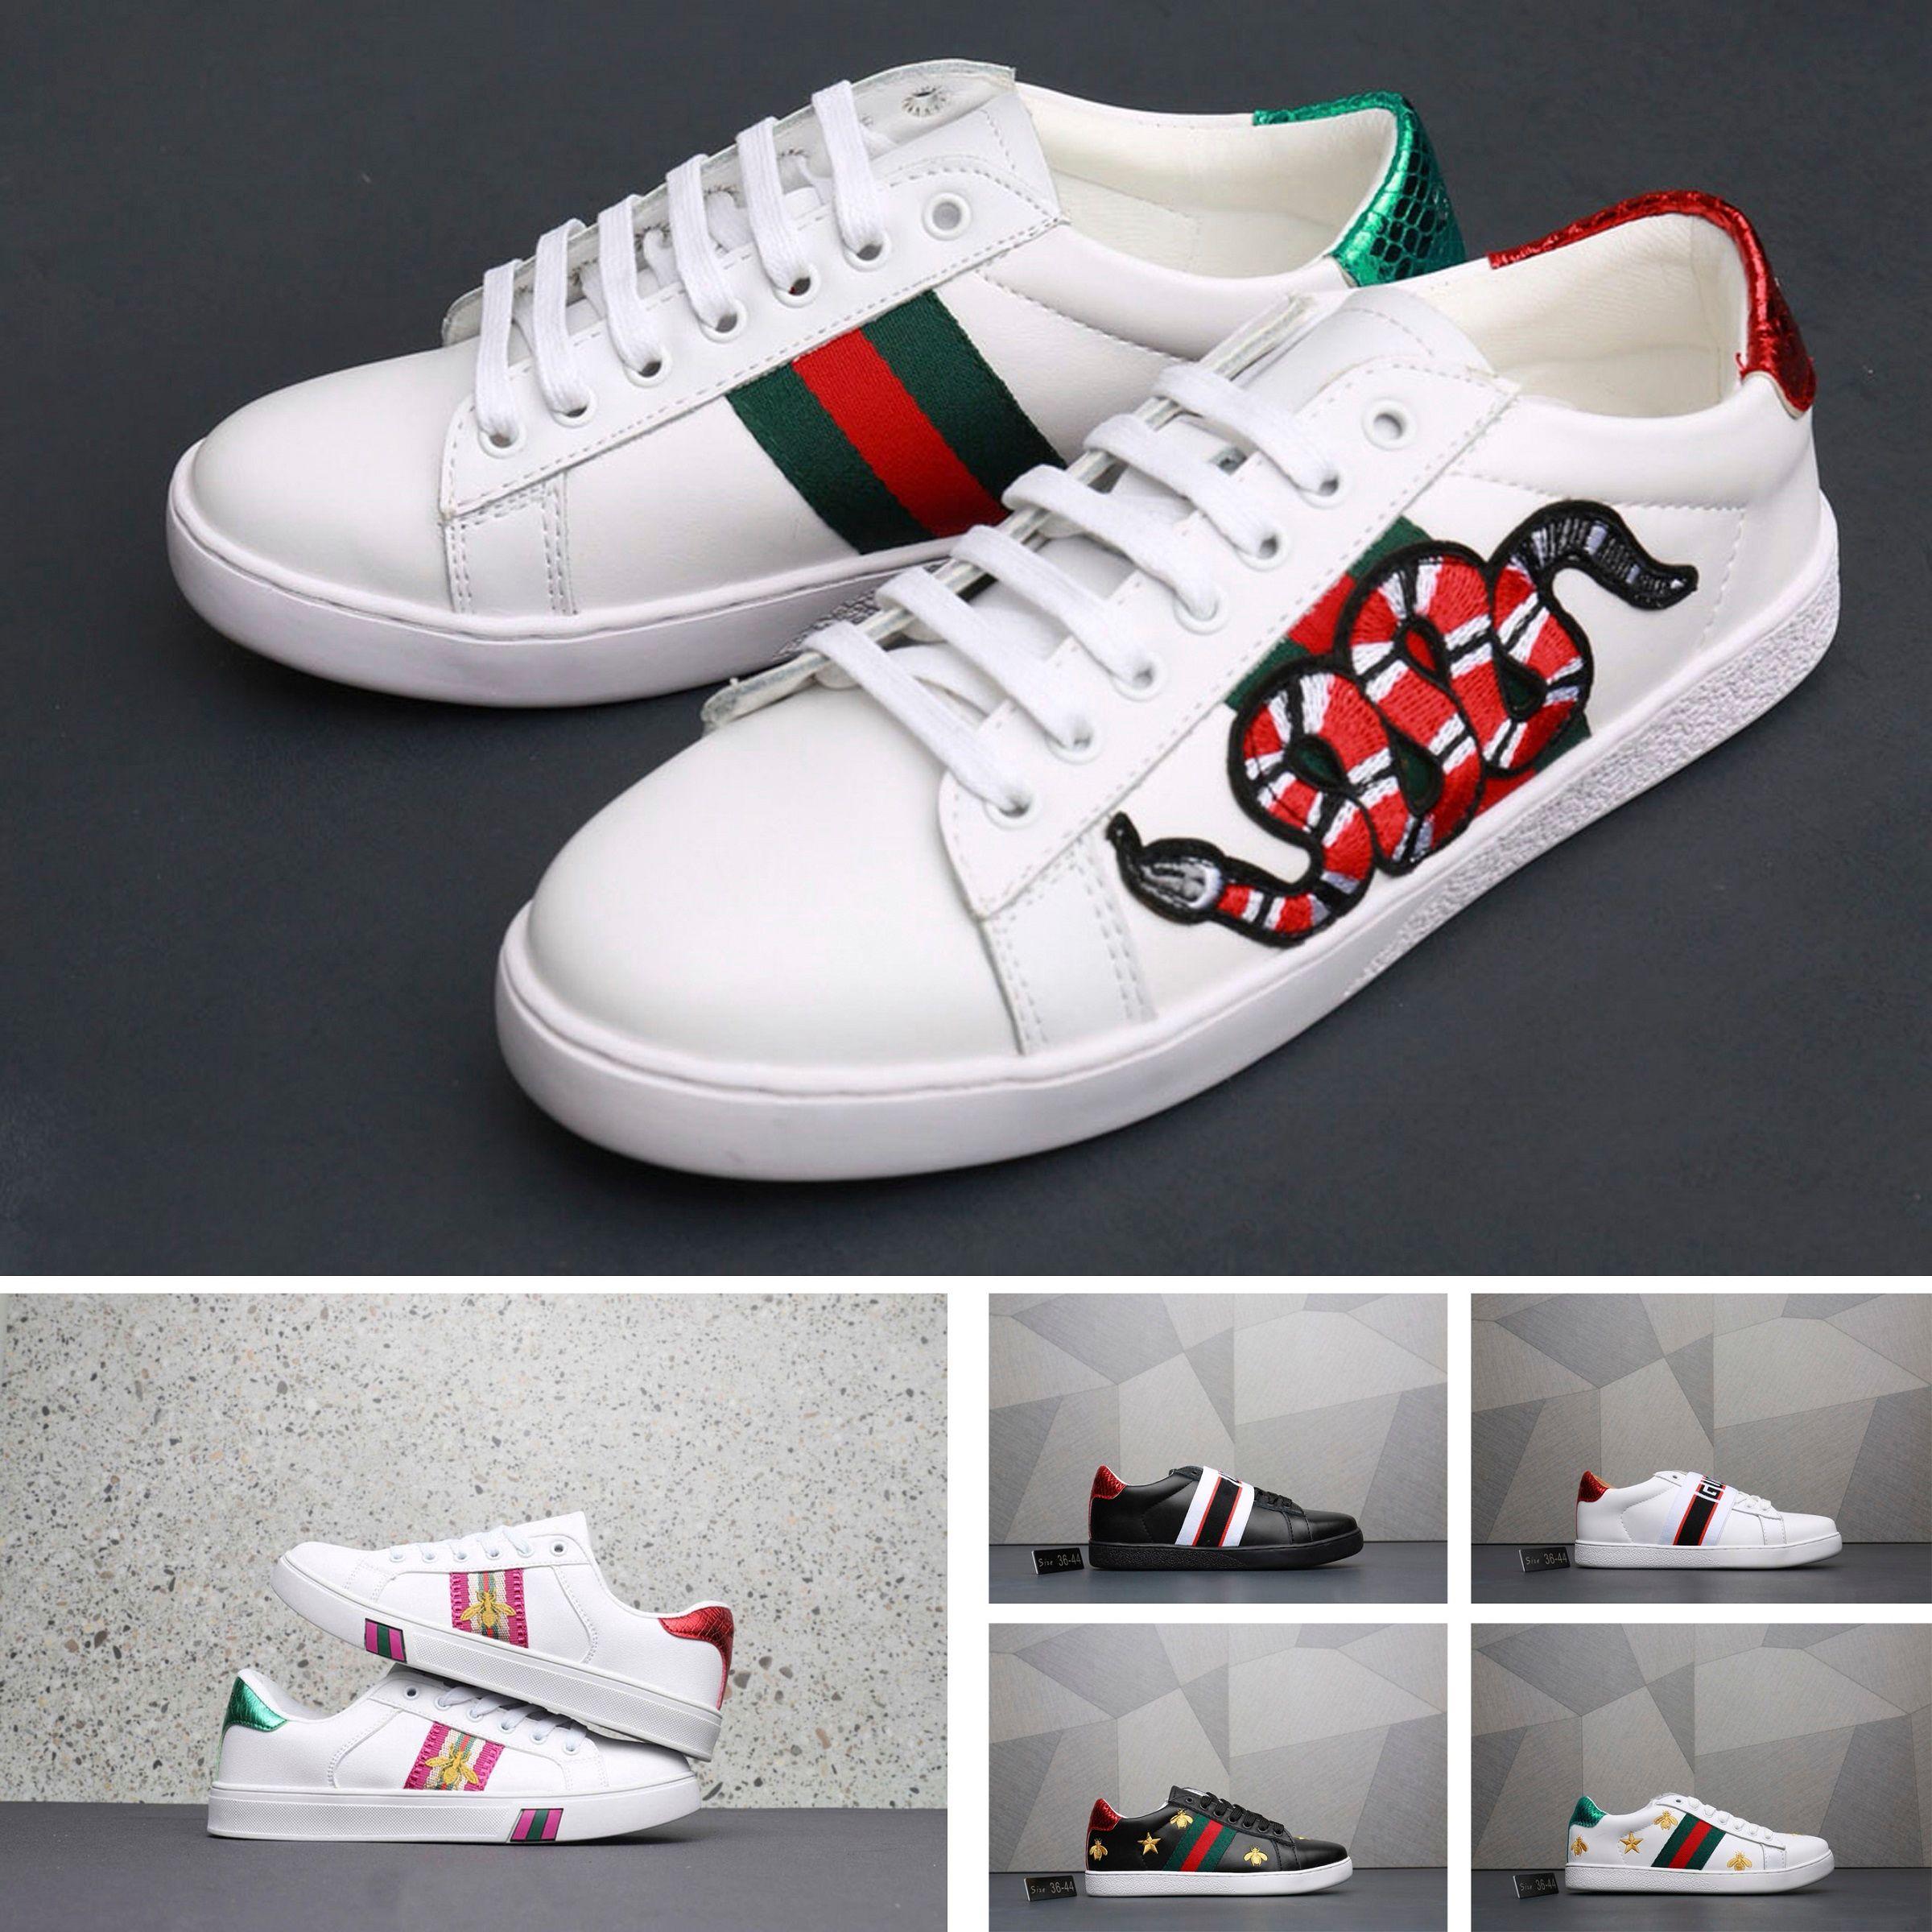 dfa9be03c Compre Gucci Men Shoes Gucci Women Shoes Best Selling Sneakers Bordados  Tênis, Letras Bordadas, Cosmos, Tênis, Cabeça De Lobo, Homens Sapatos  Mulheres ...